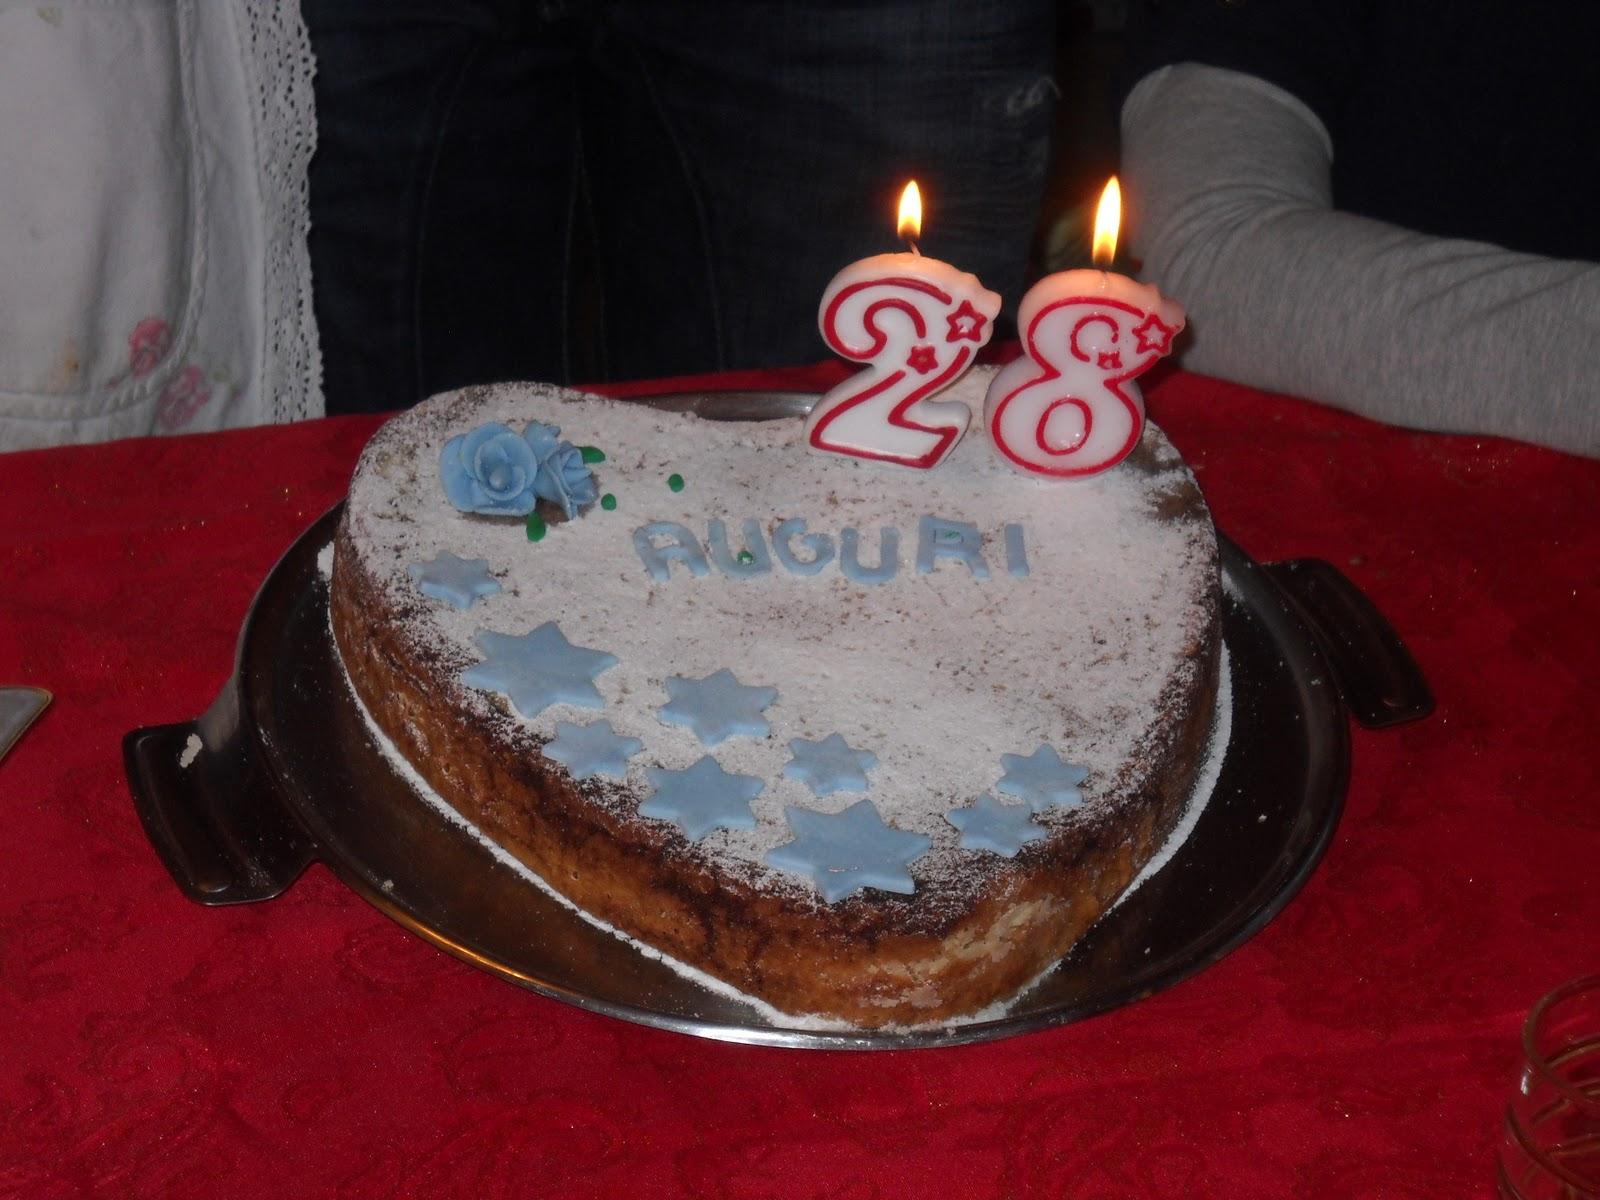 Sorprese Per Un Compleanno baby sugar in cucina: caprese al limone per un compleanno a